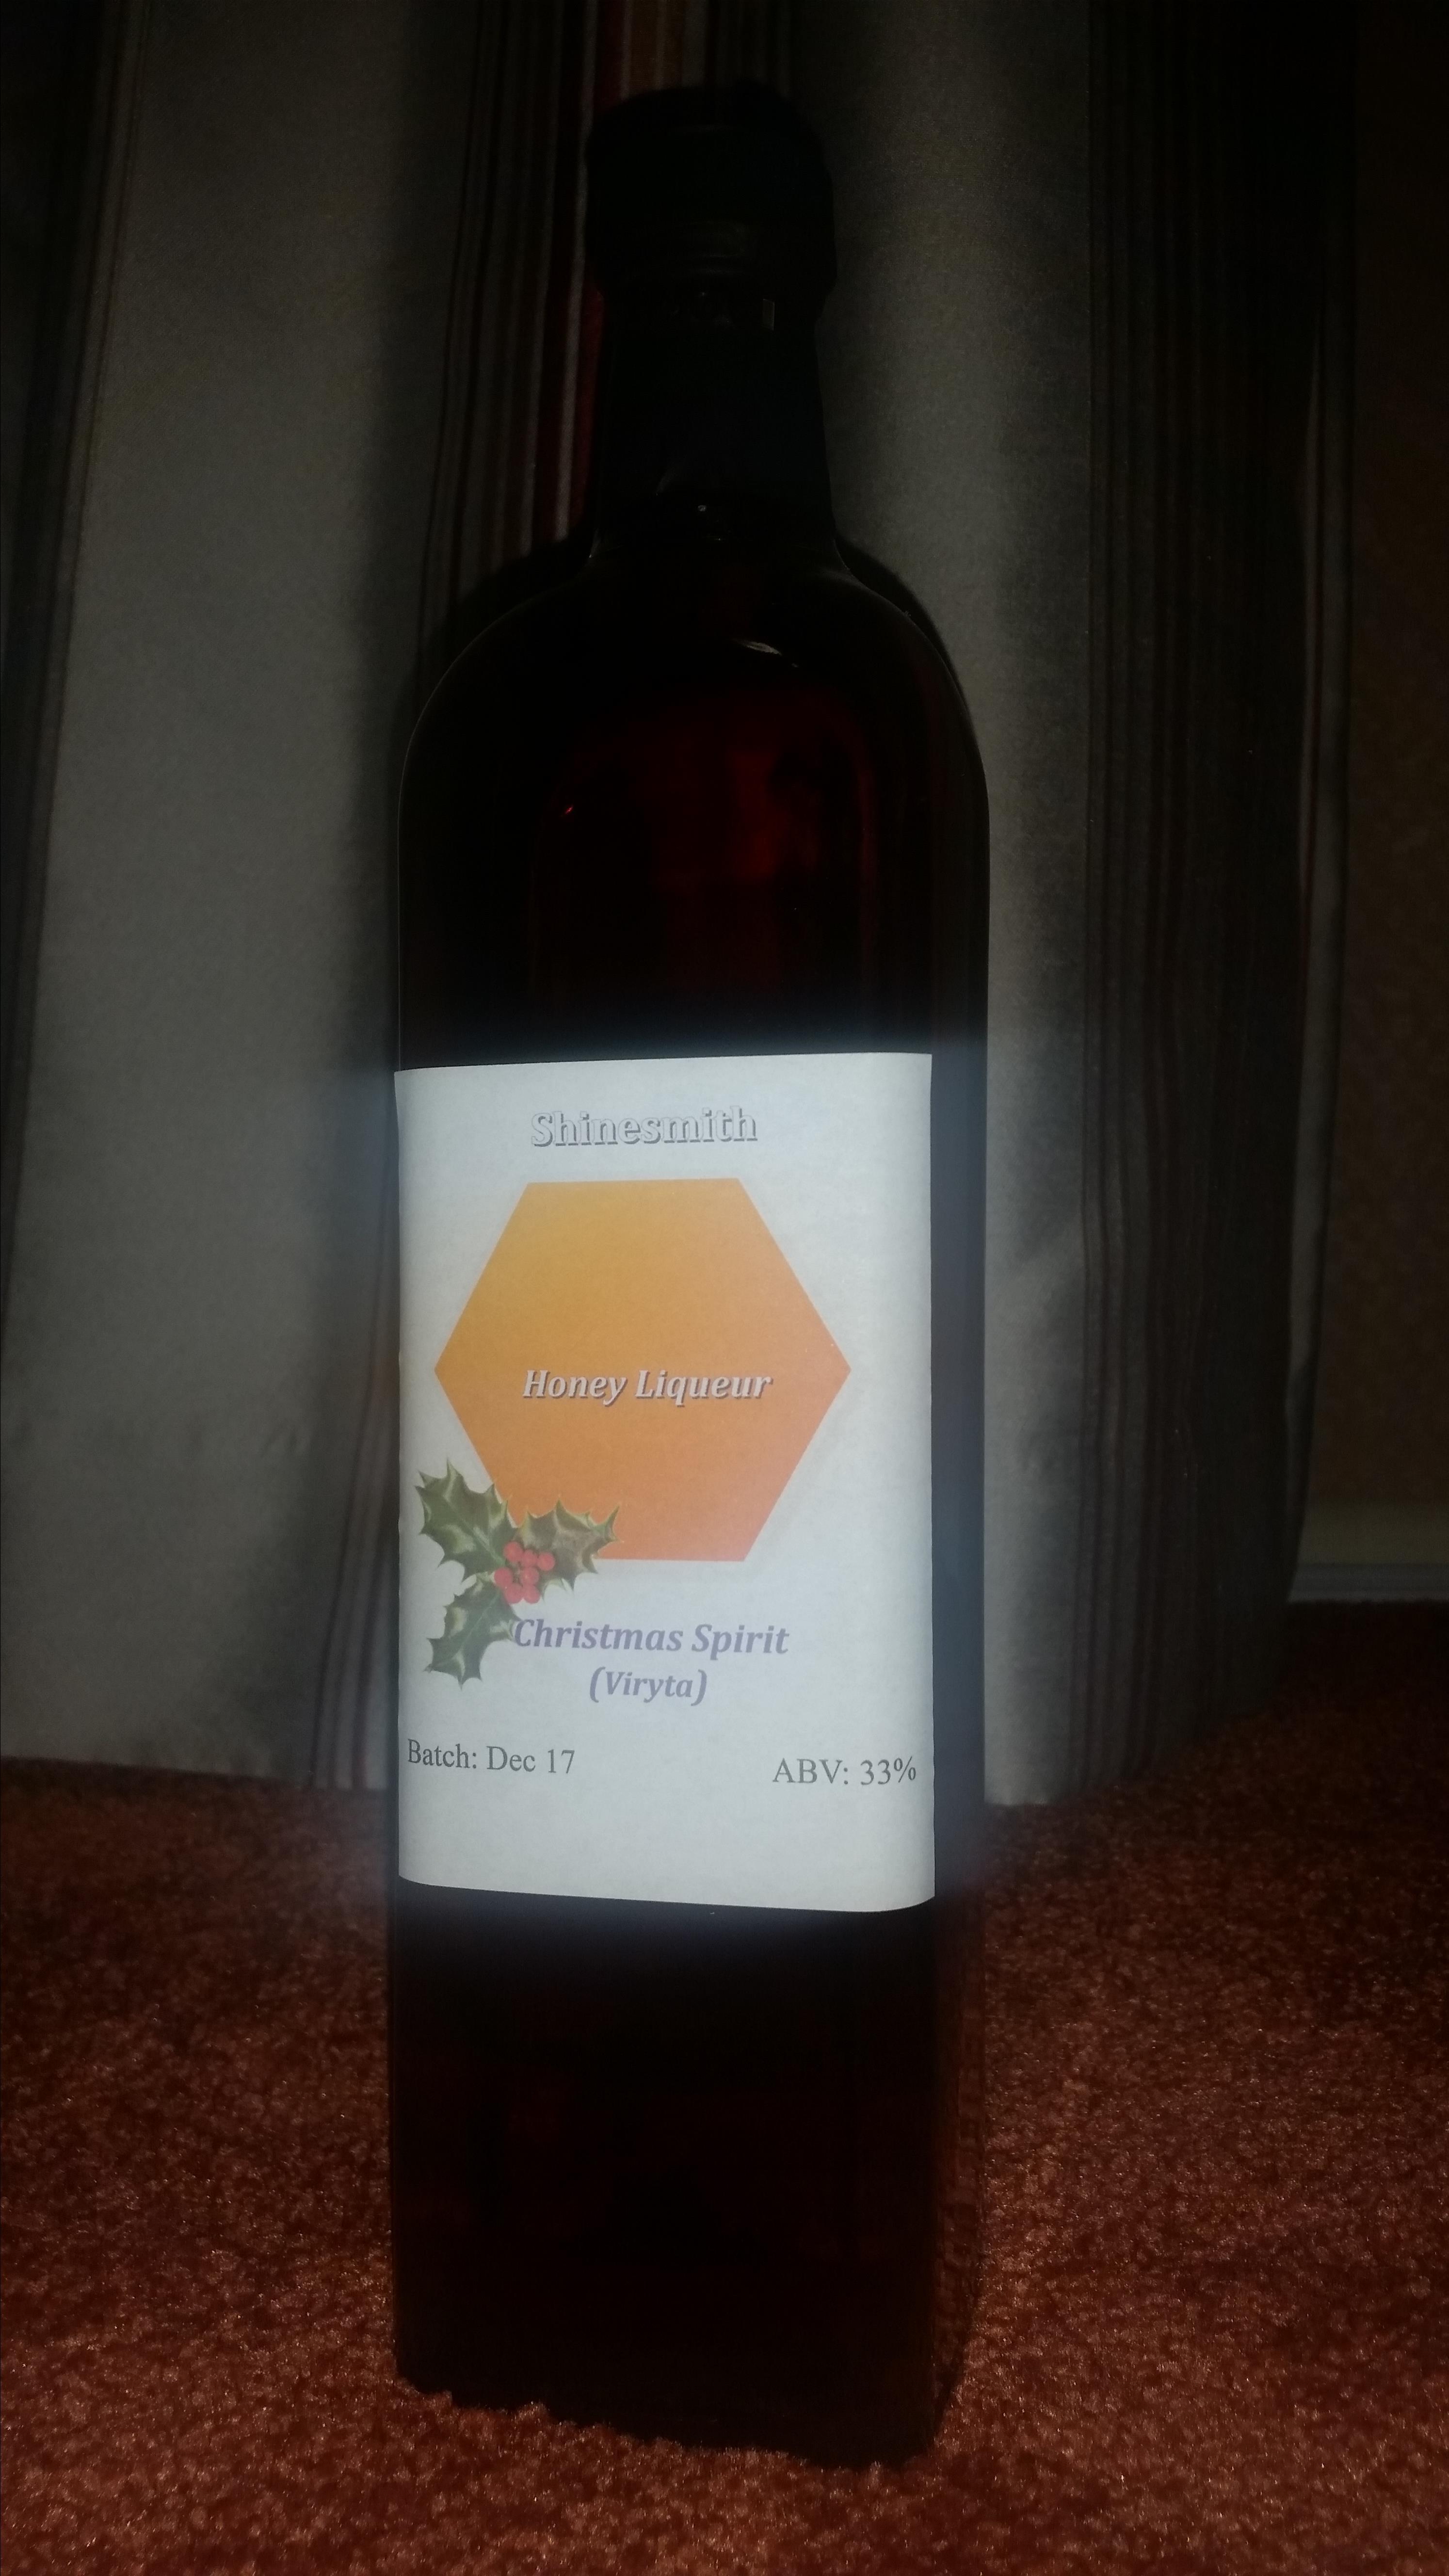 Viryta (Lithuanian Honey Liqueur)